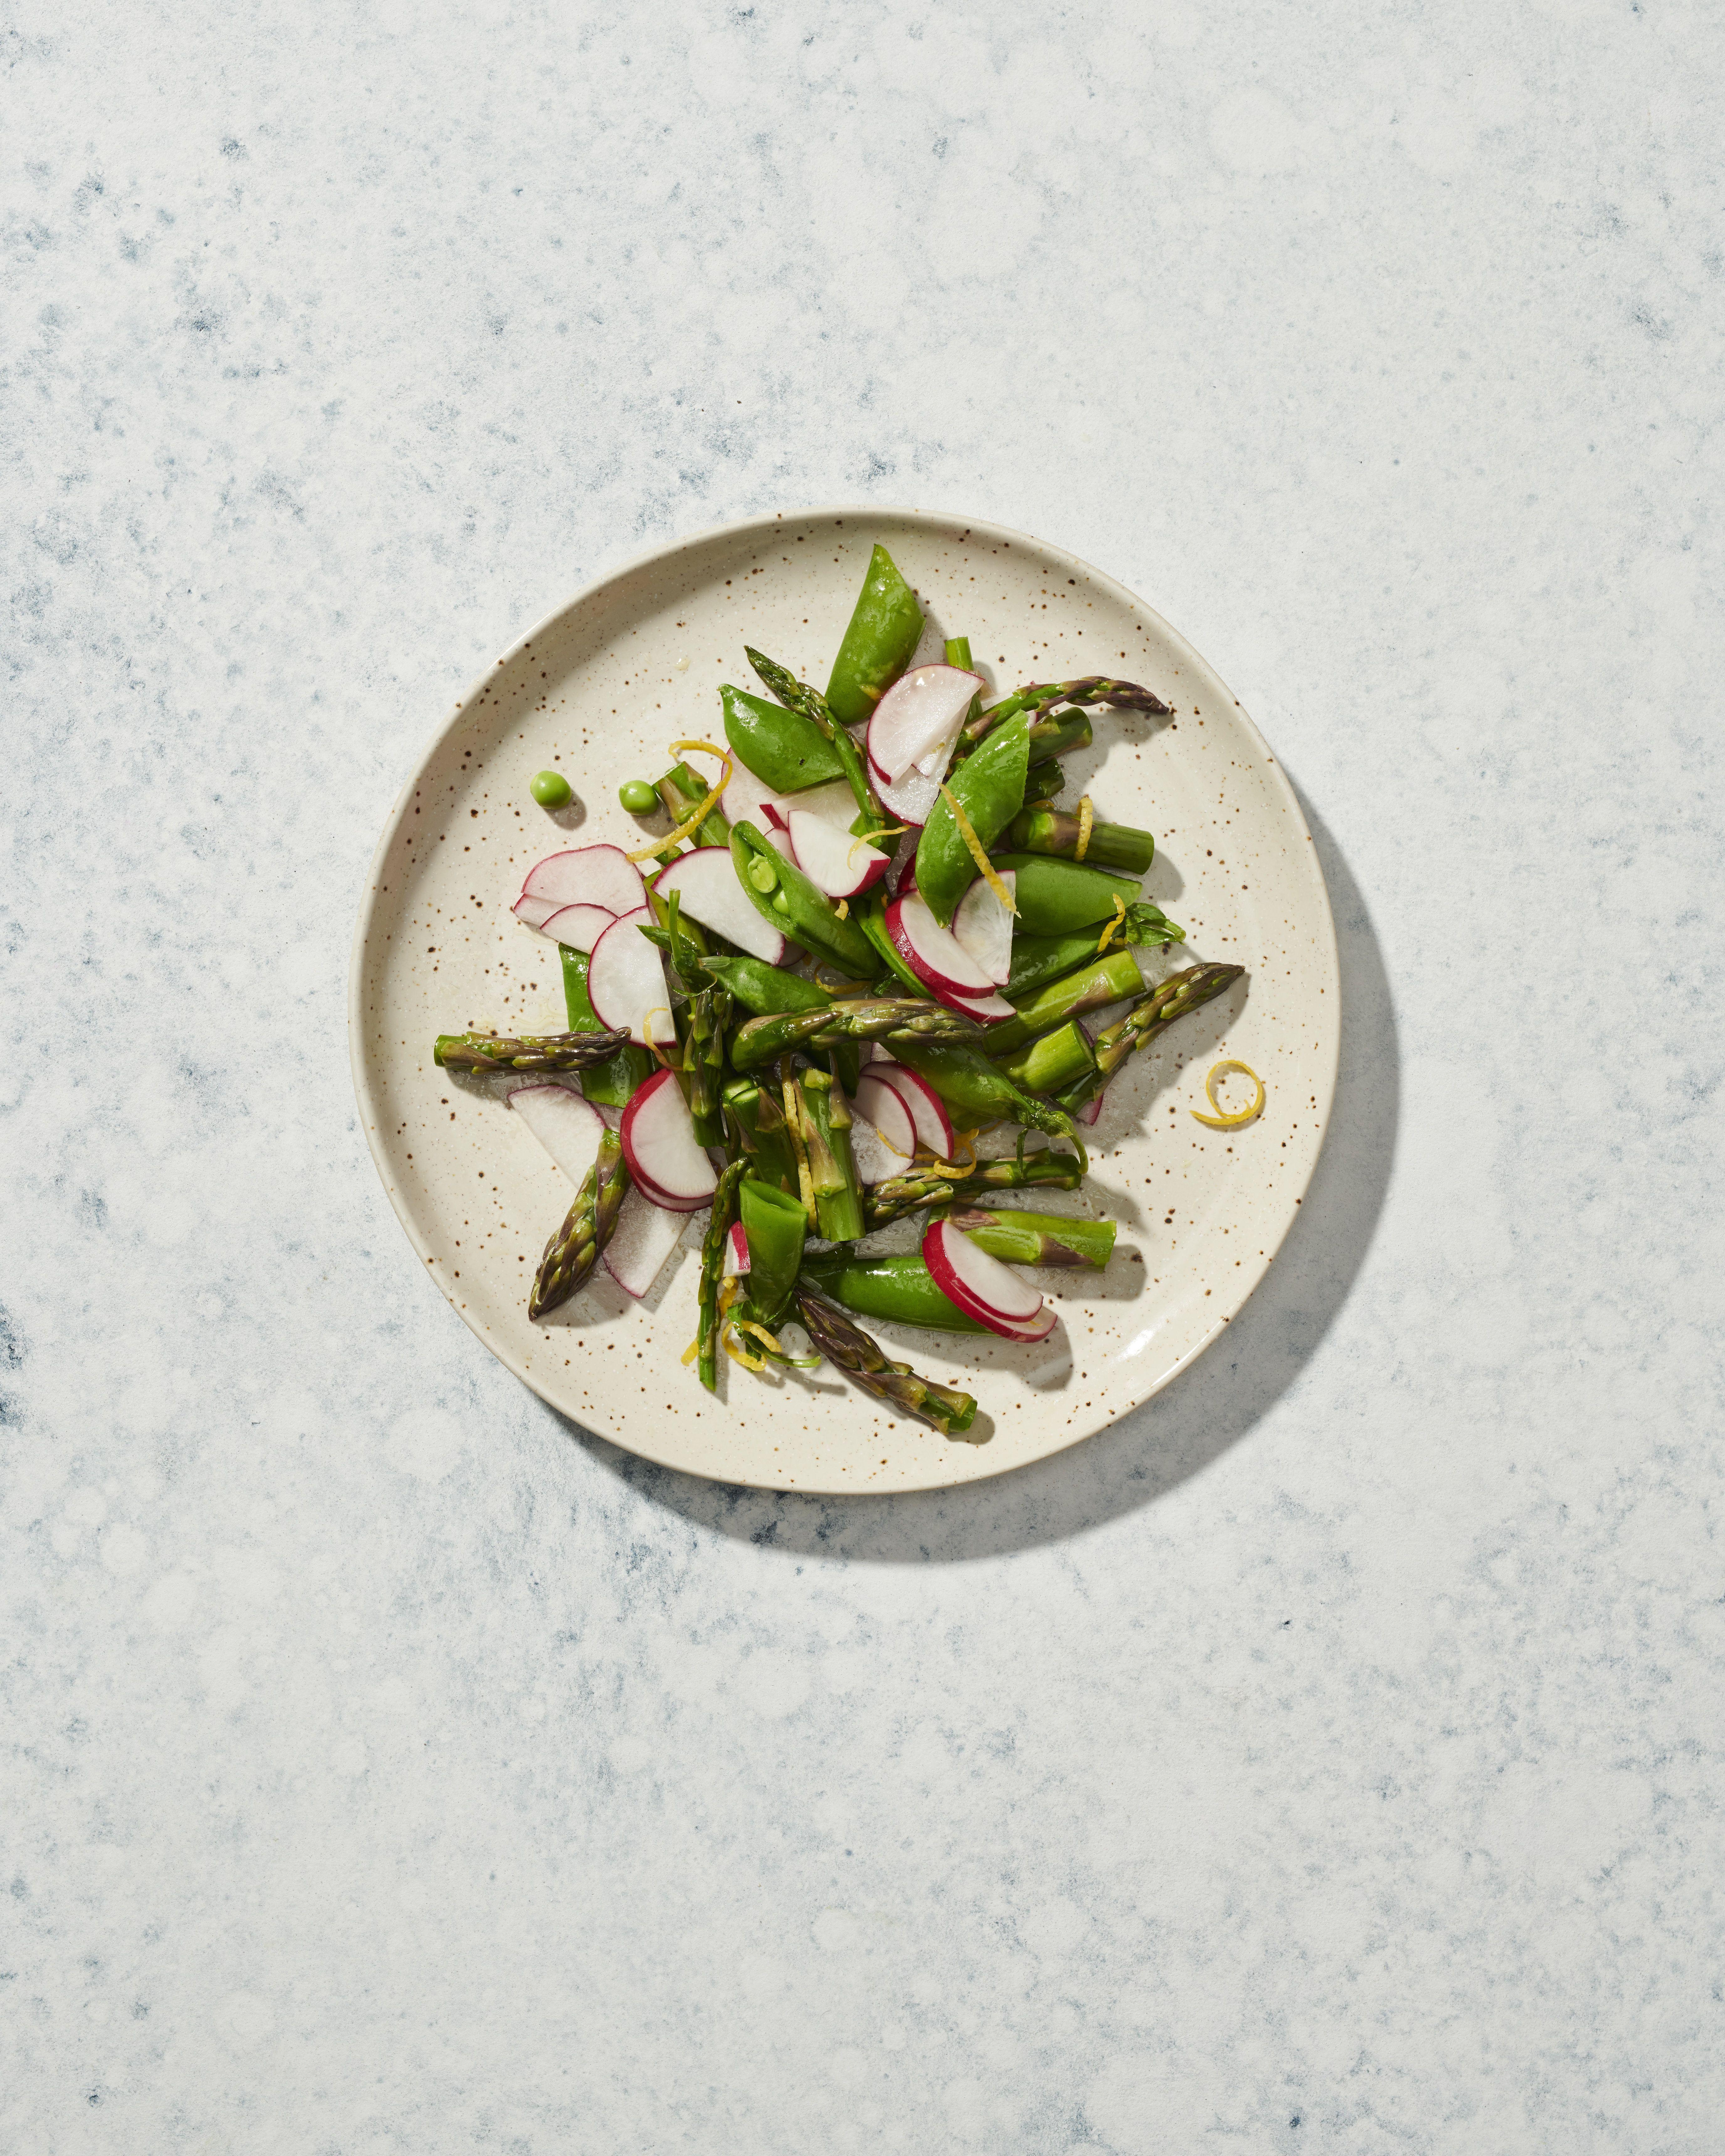 Slice Slice Baby Sweetgreen Seasonal Salad Burrata Salad Green Goddess [ 6880 x 5504 Pixel ]